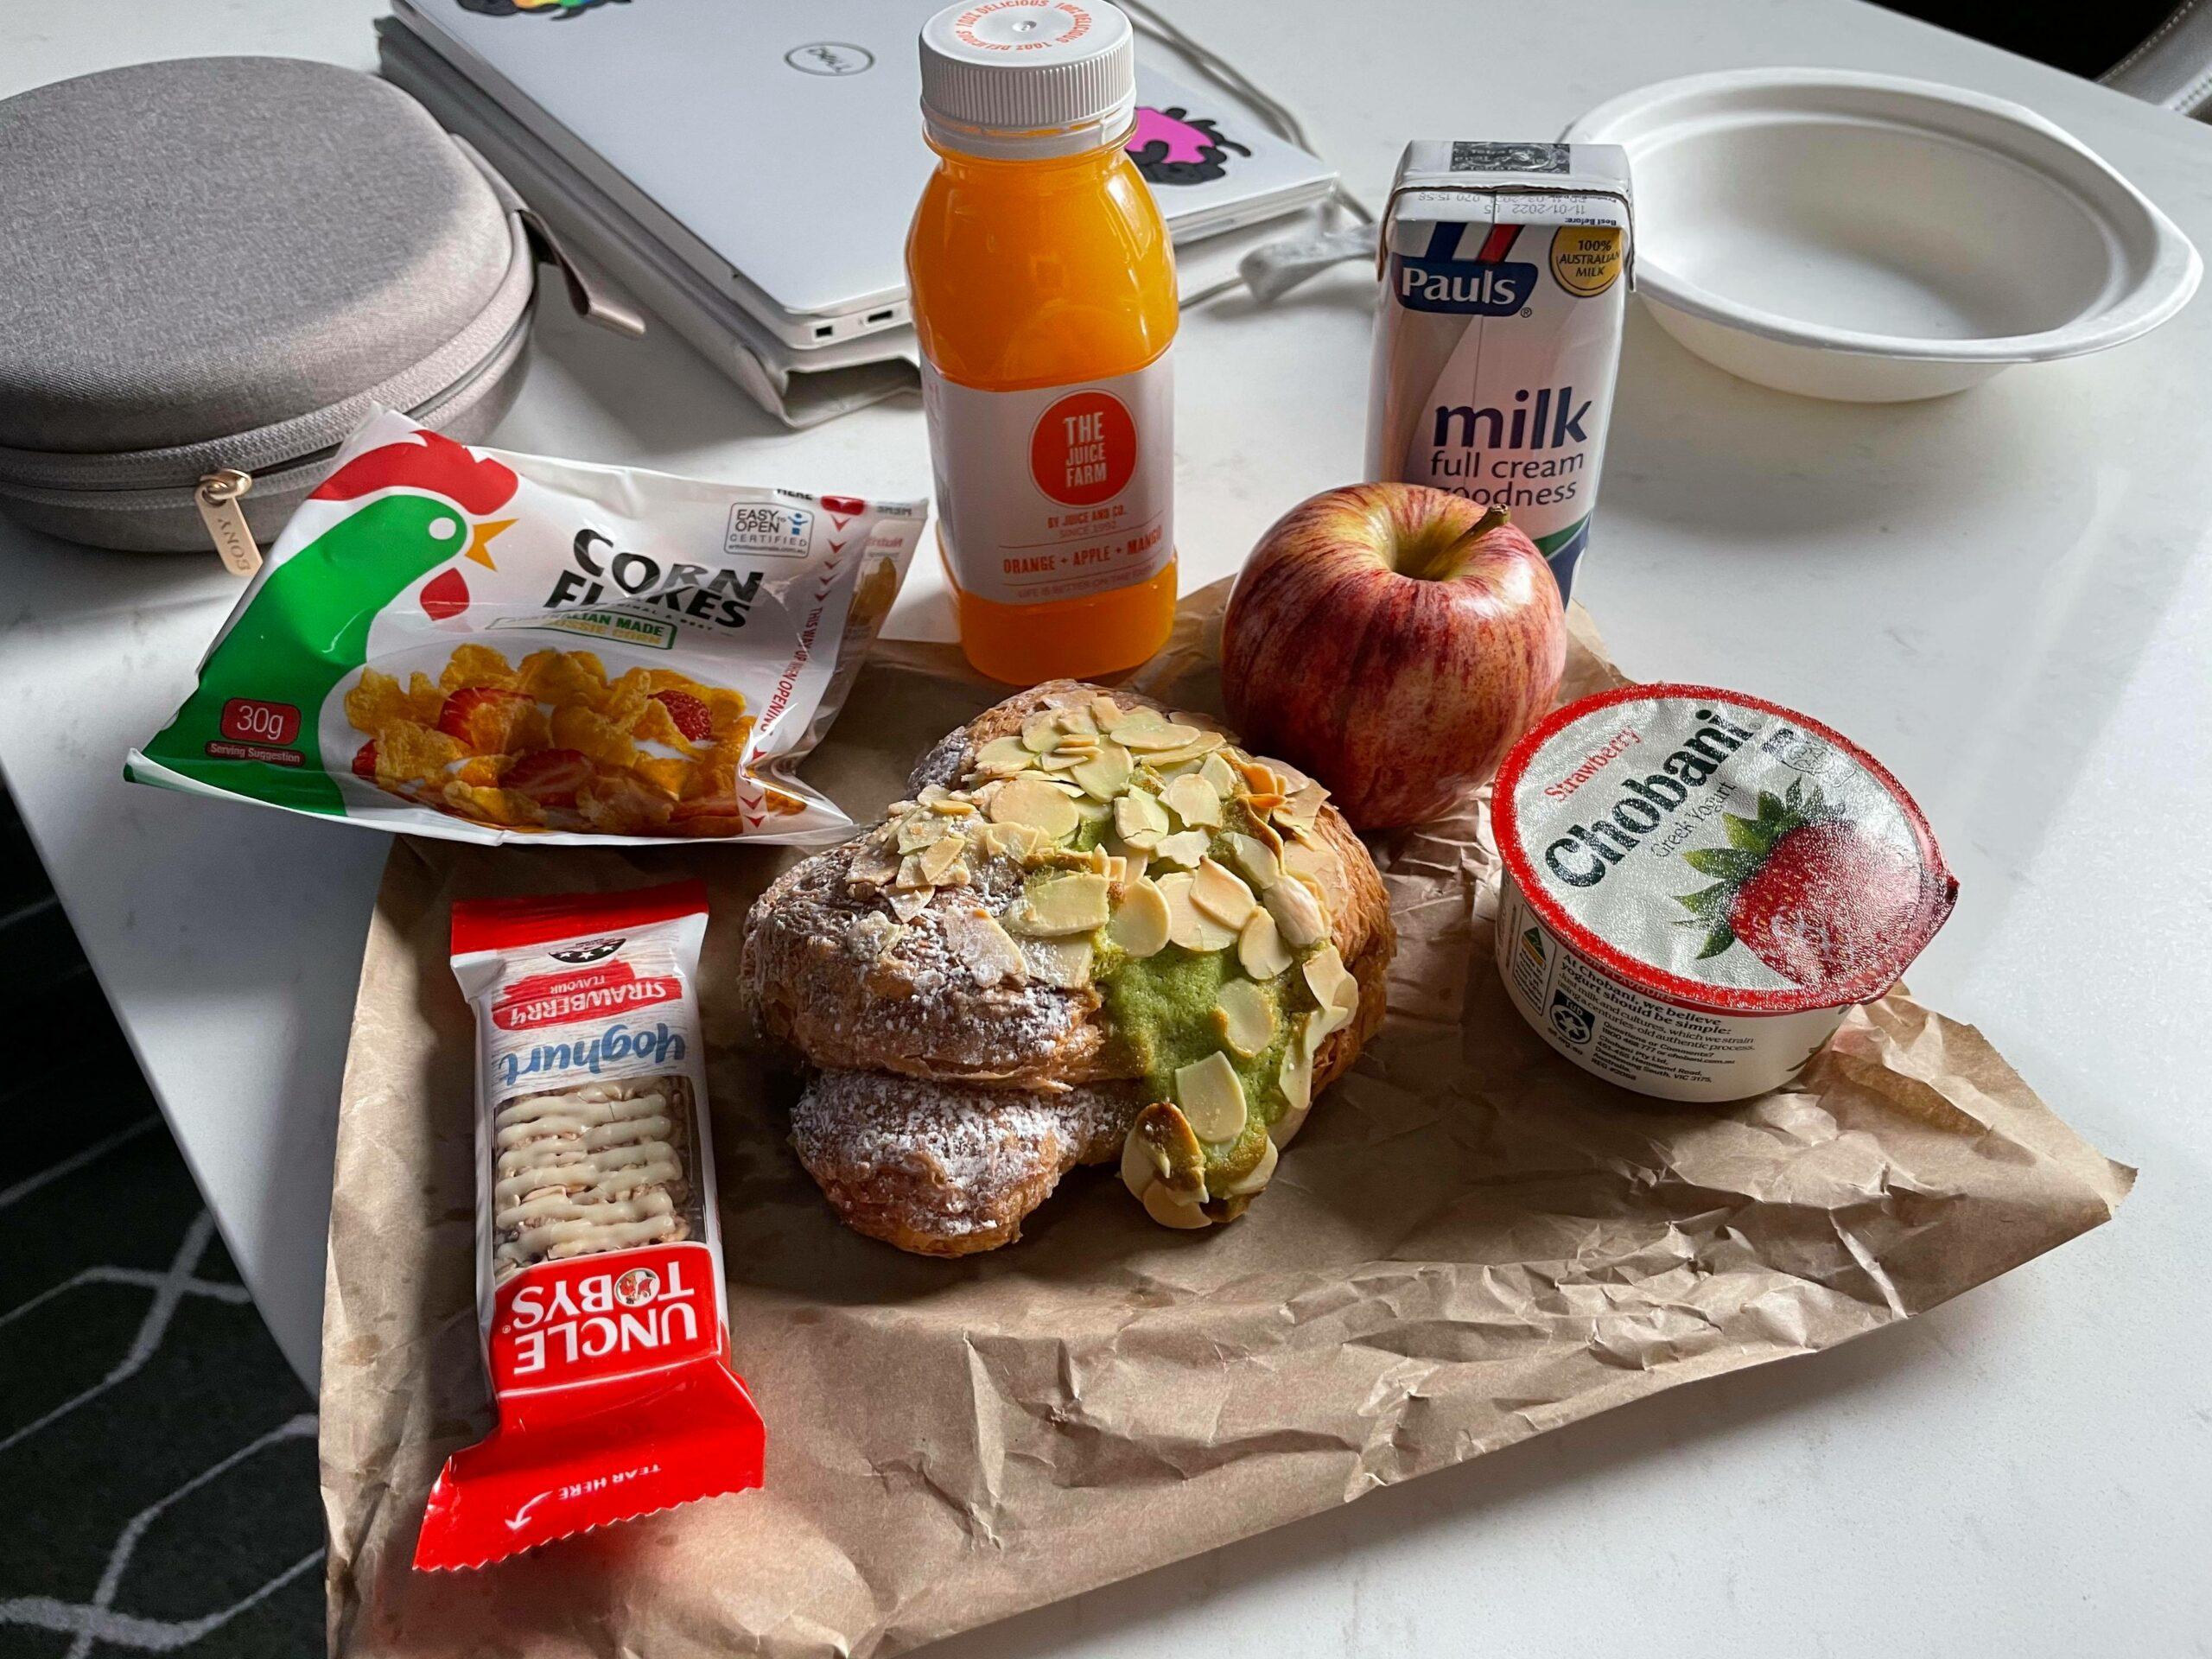 almond croissant yoghurt juice laid out on brown paper bag